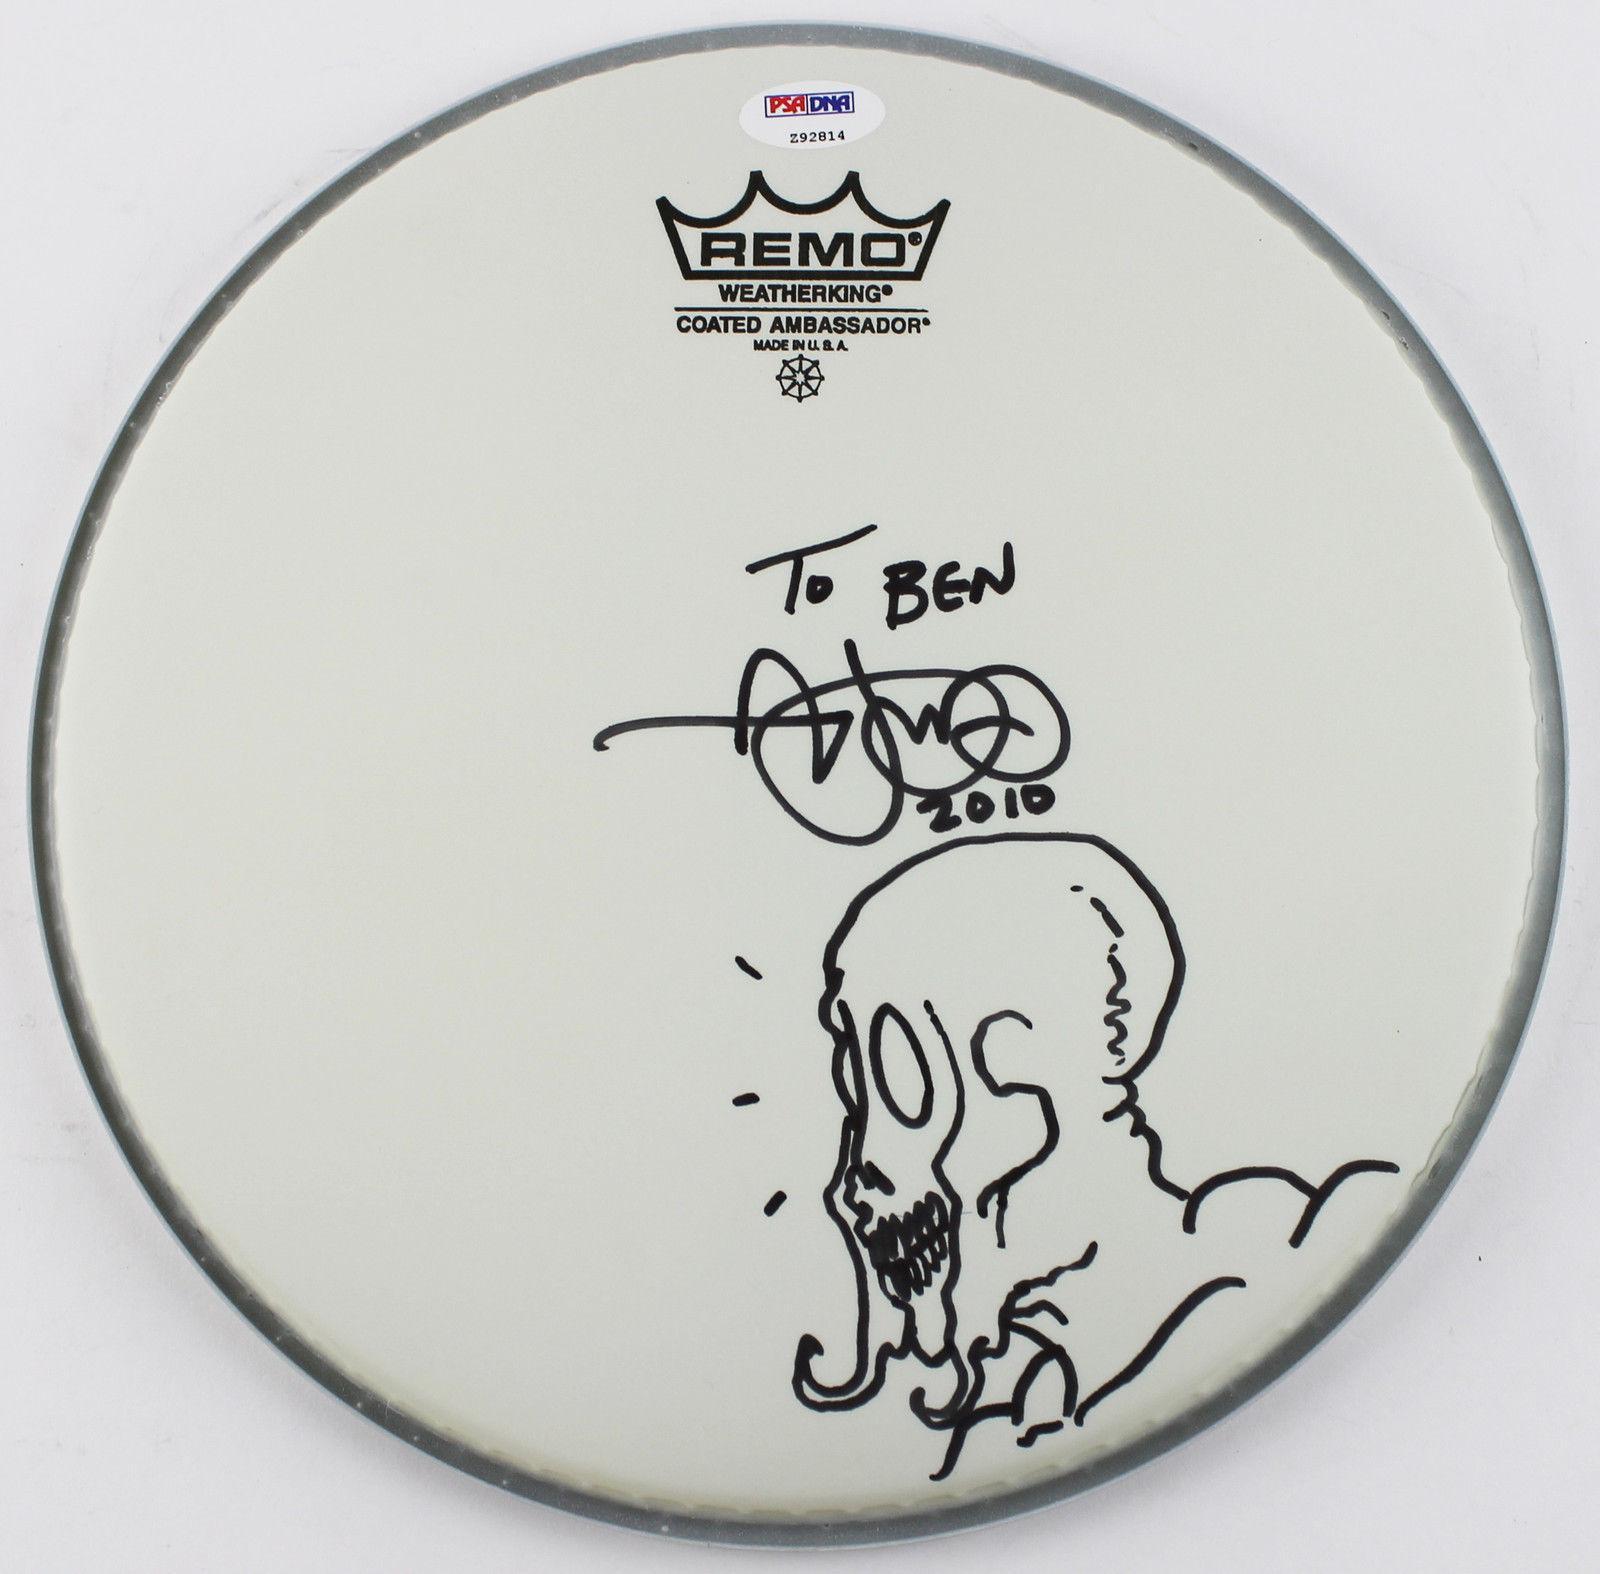 Adam Jones Of Tool Signed Remo Drumhead W/ Rare Sketch Psa/dna Coa Z92814